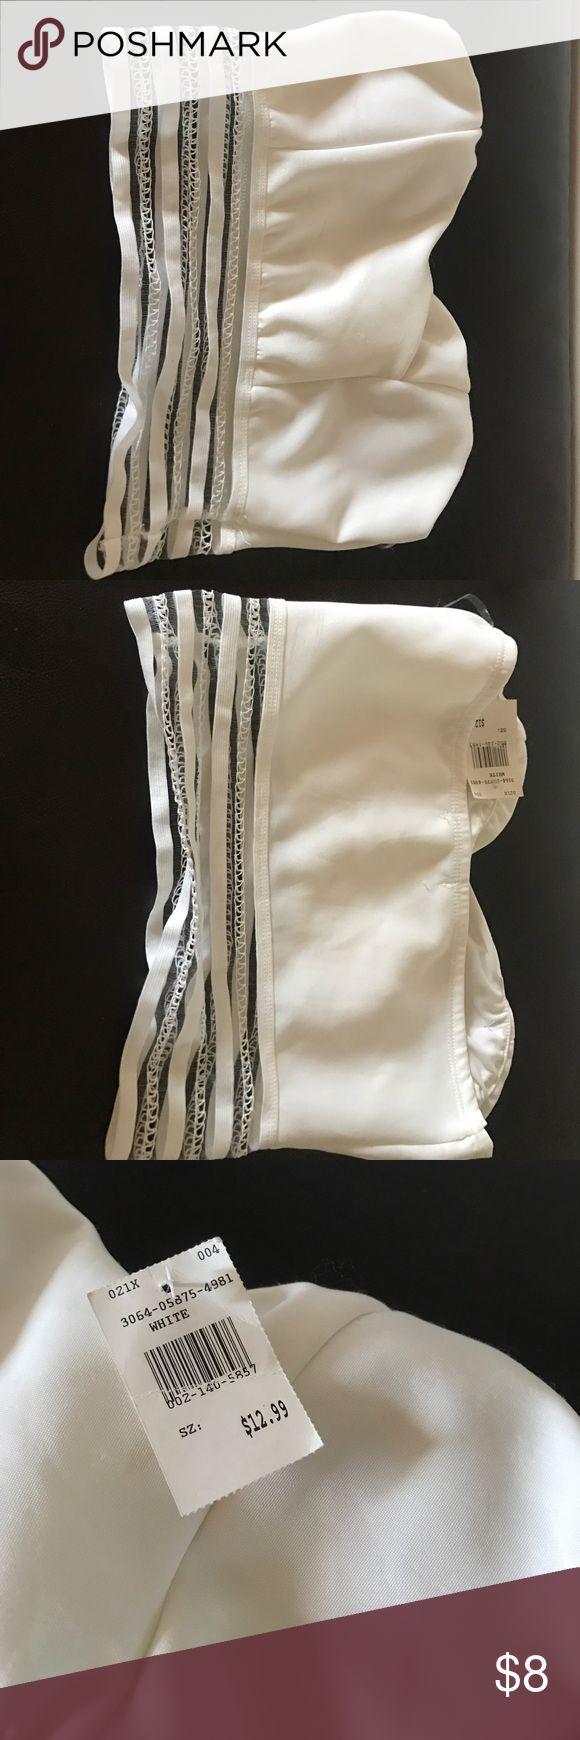 White strapless tube top Strapless white tube top Tops